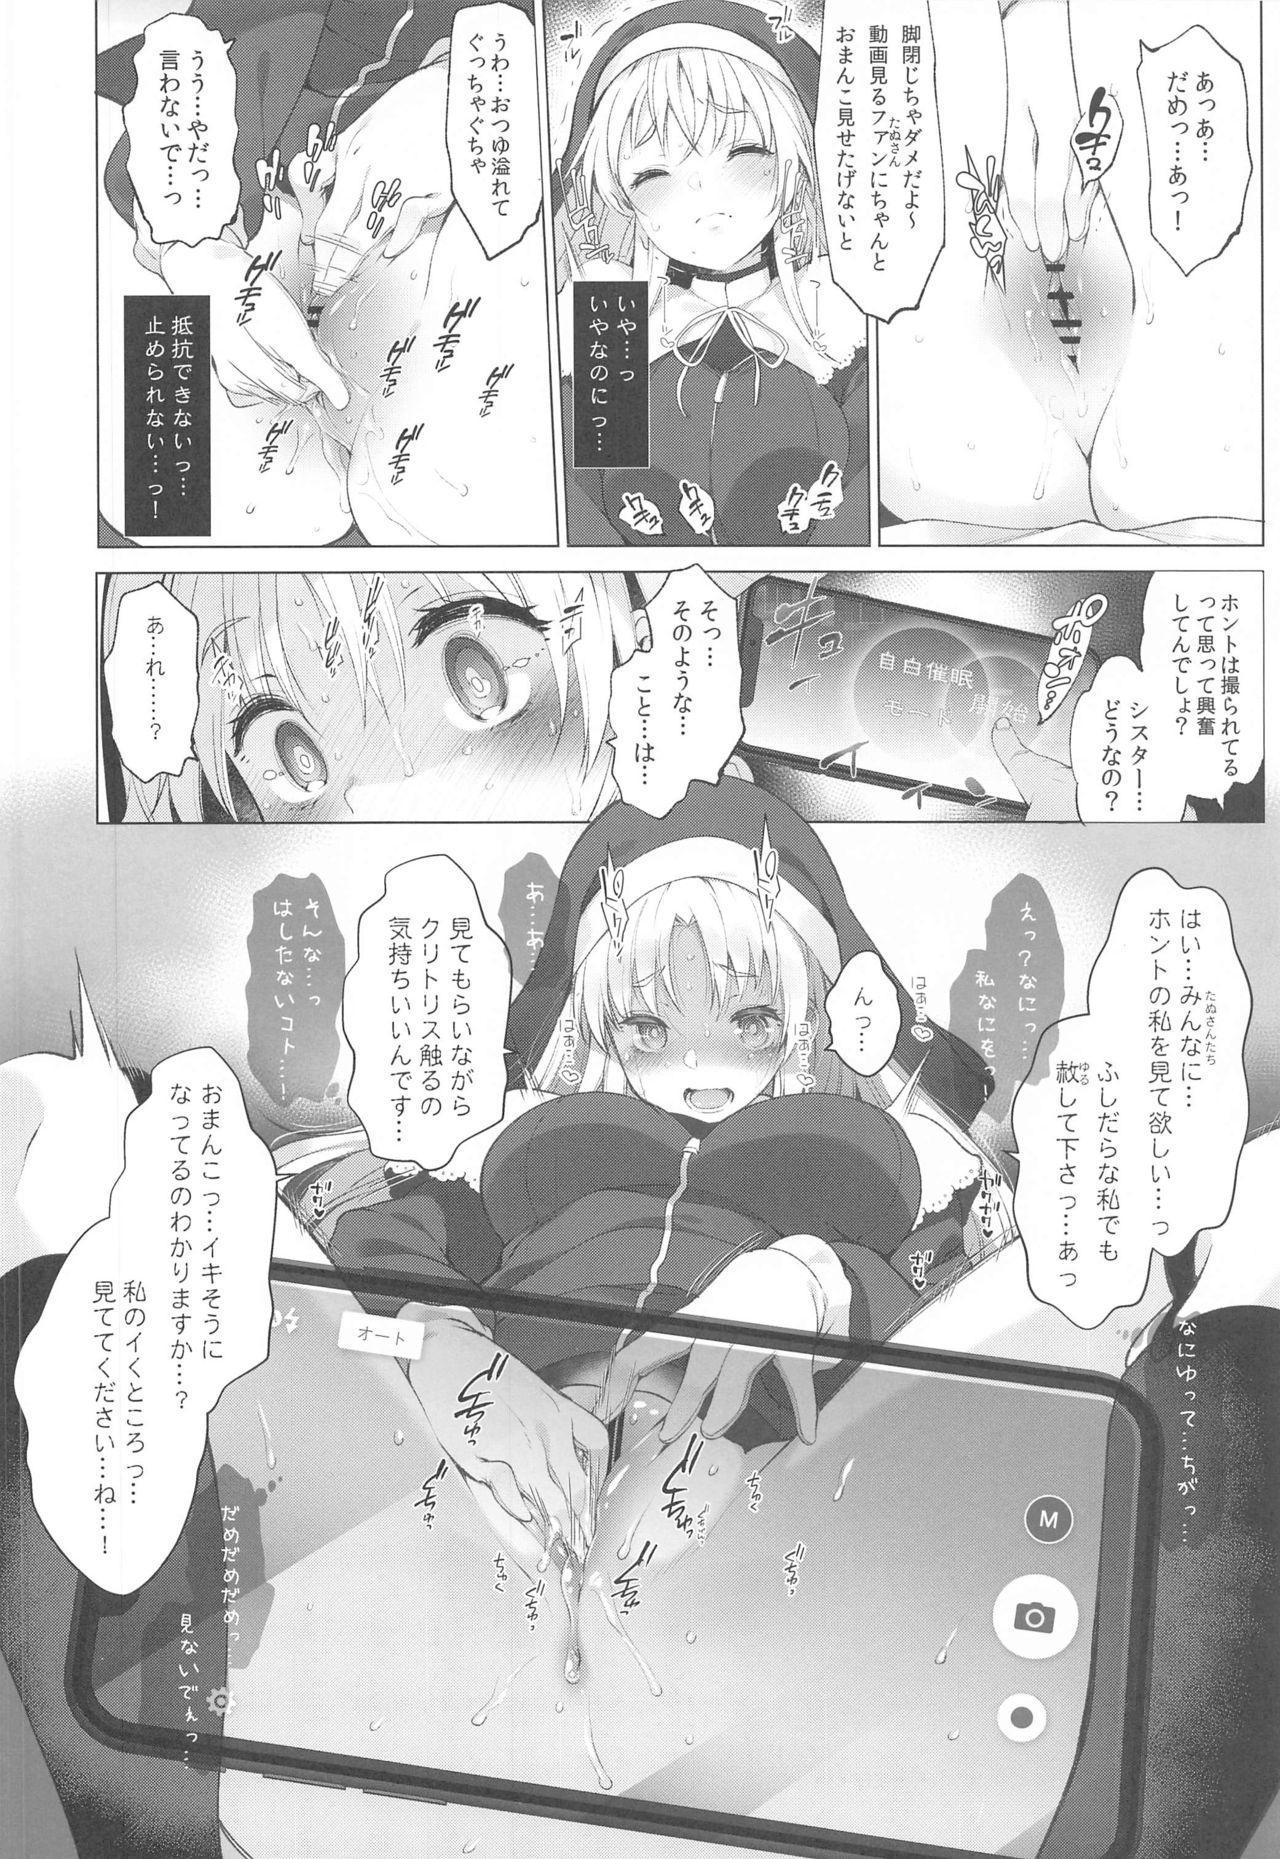 Sister Cleaire to Himitsu no Saimin Appli 2 8